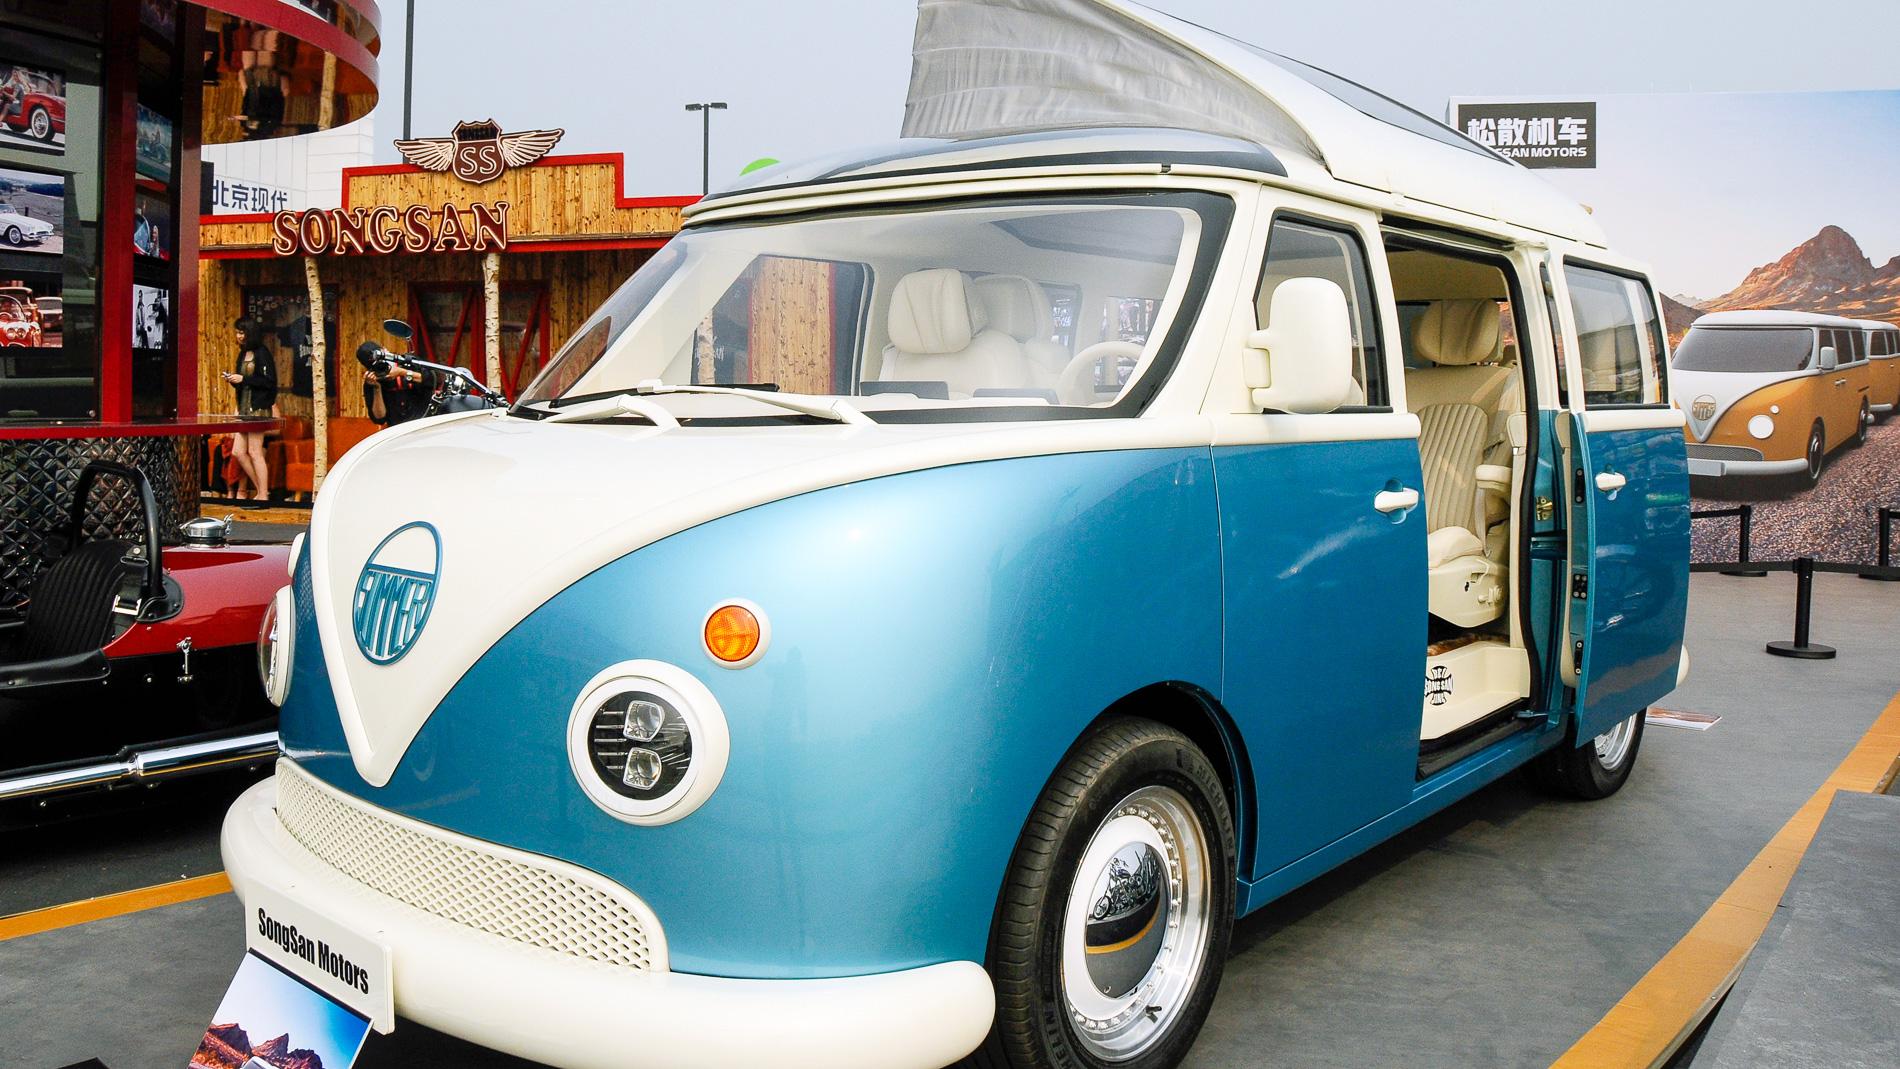 Songsan Summer - (mauvaise) copie chinoise du VW Combi